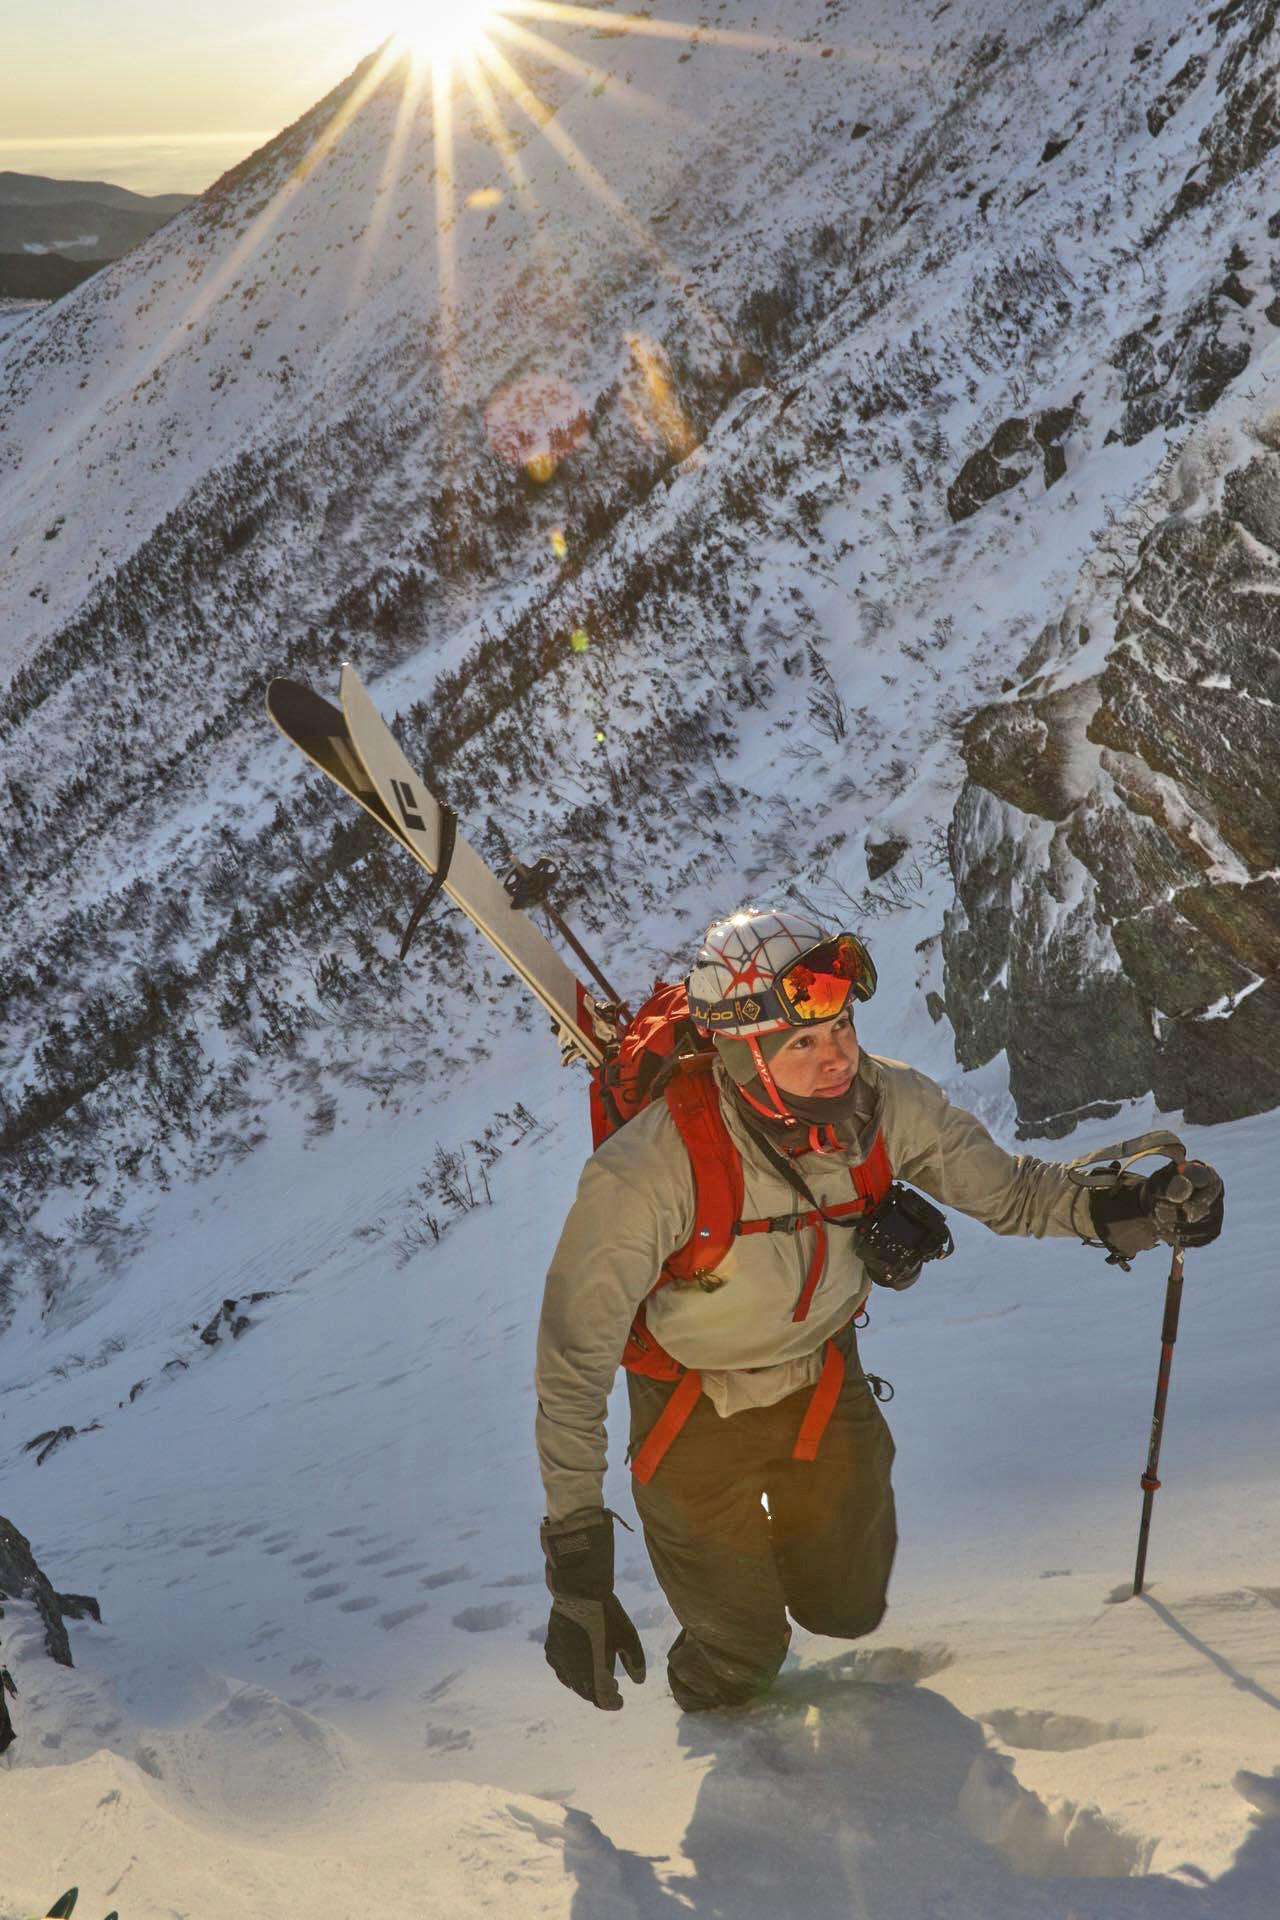 Dustin-ski-touring-Hillmanshighway.jpg